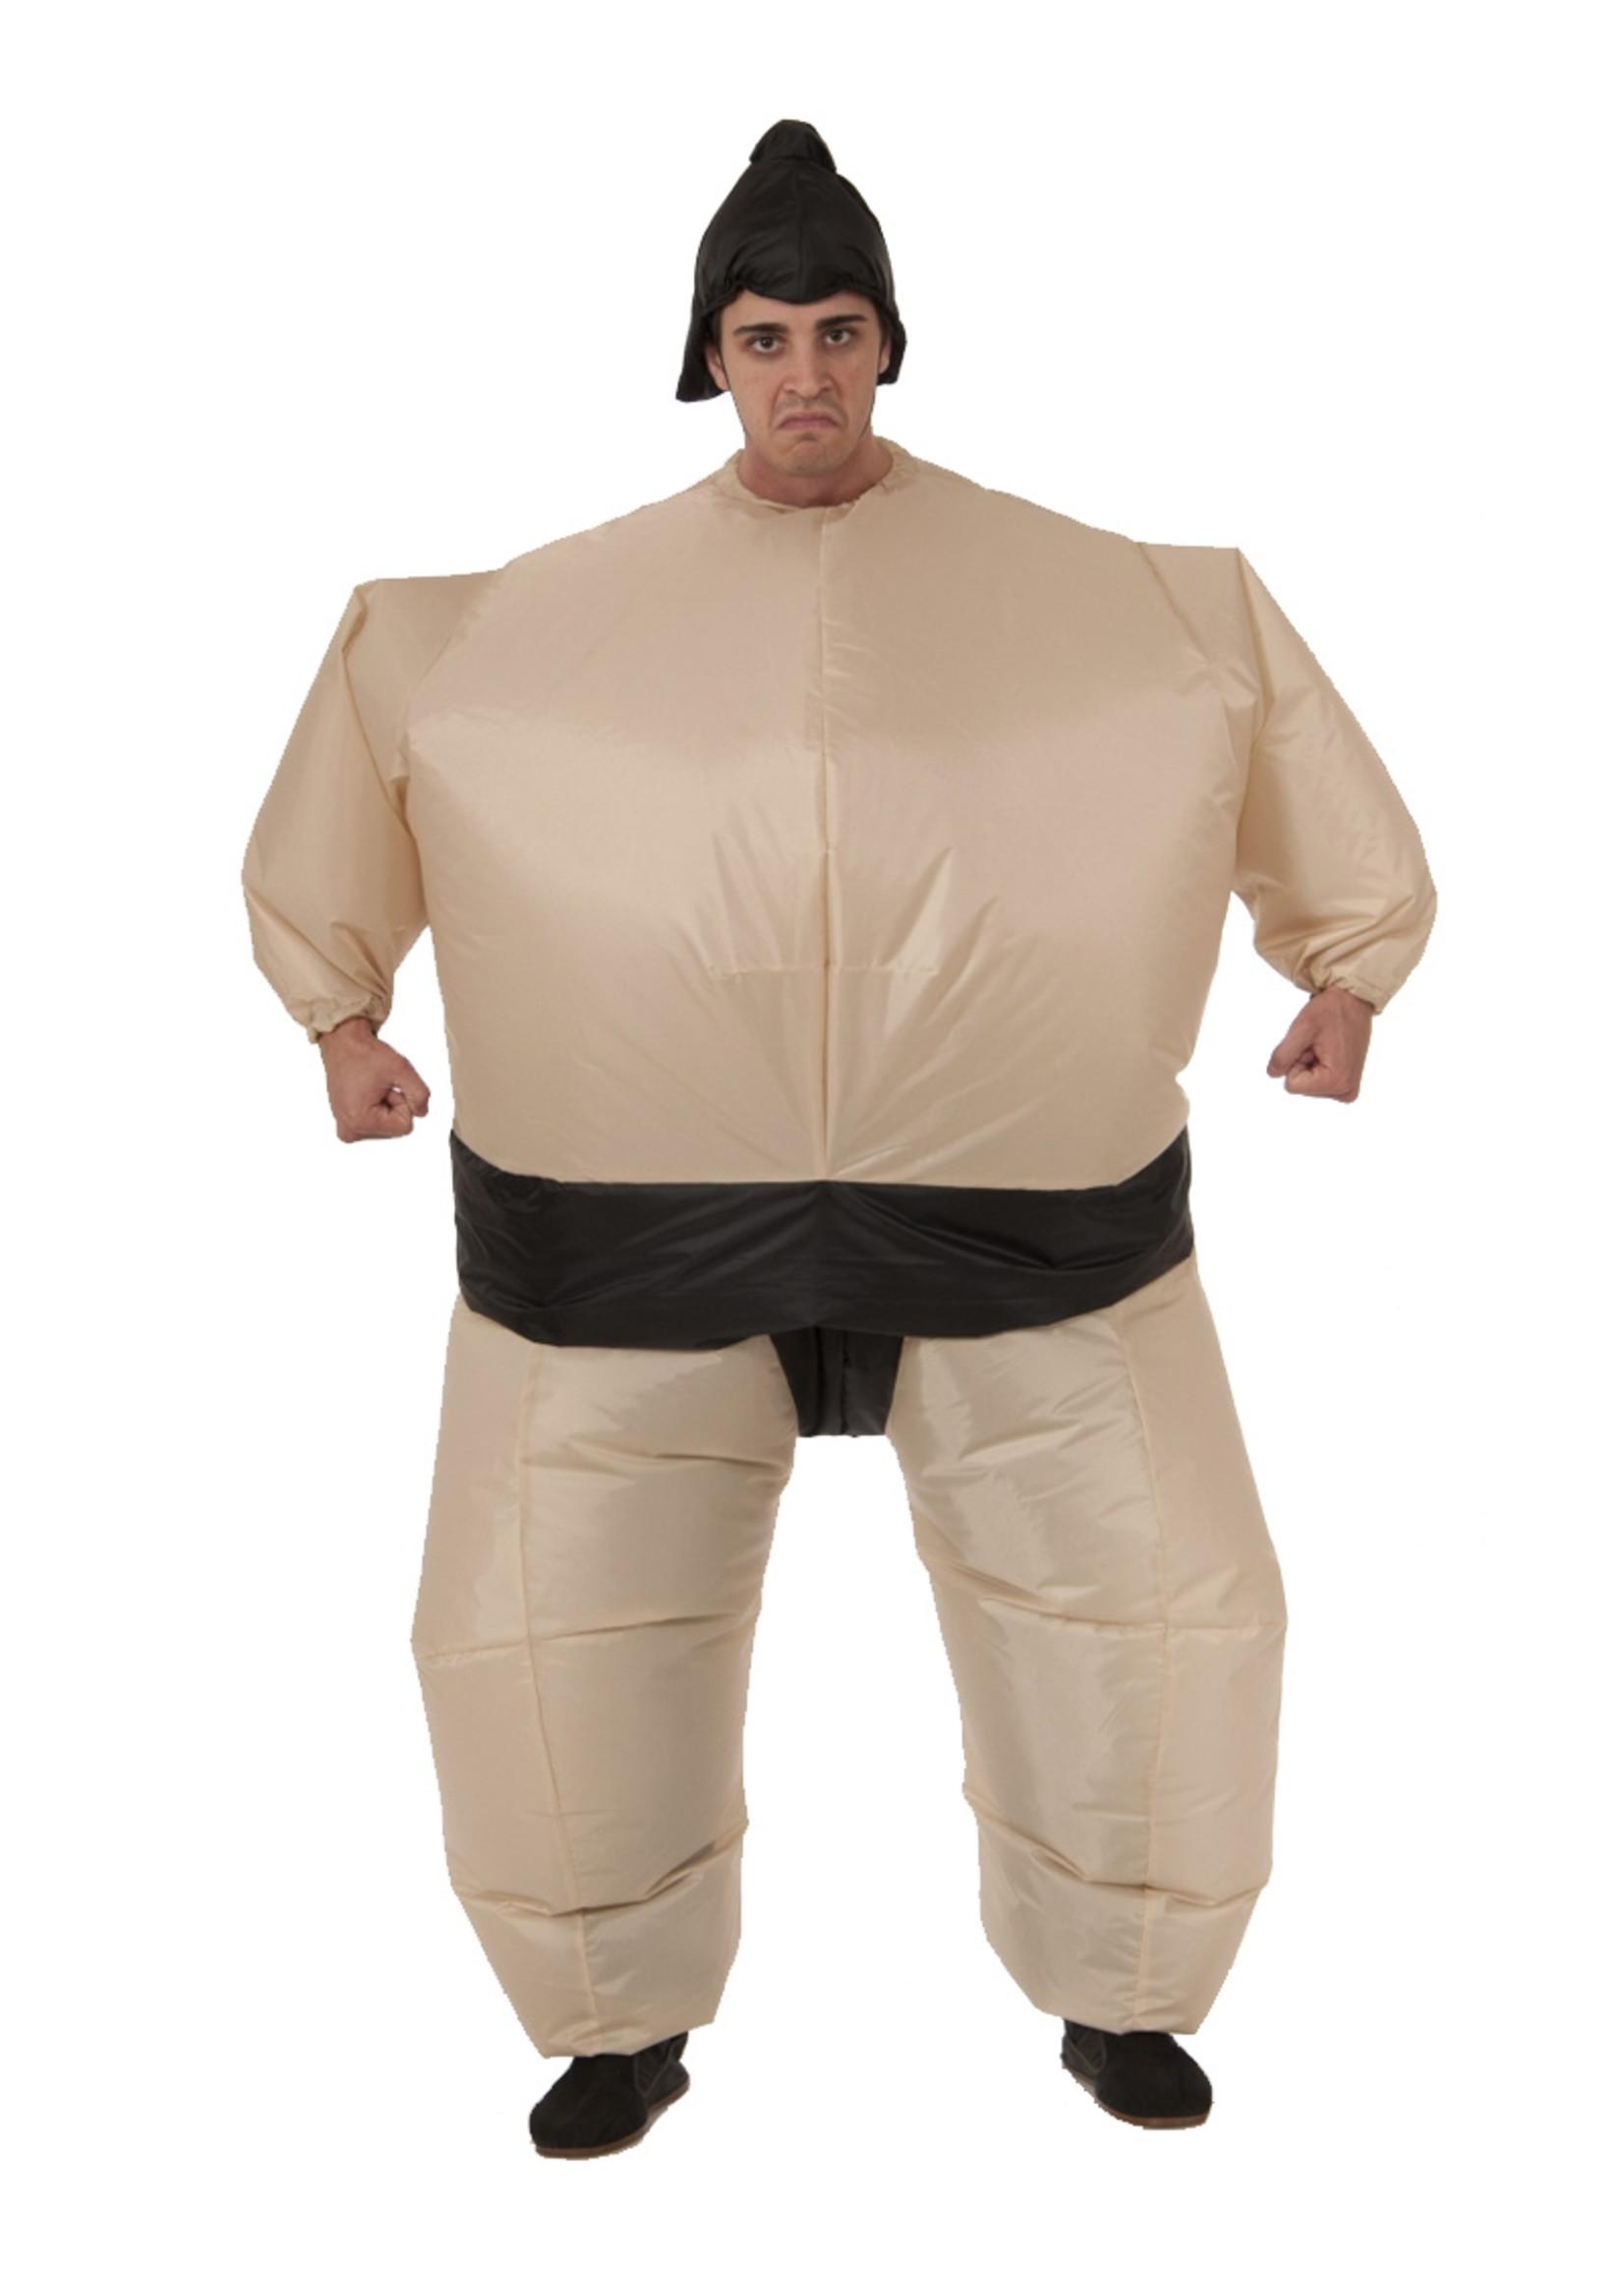 Inflatable Sumo Wrestler Costume - Humor